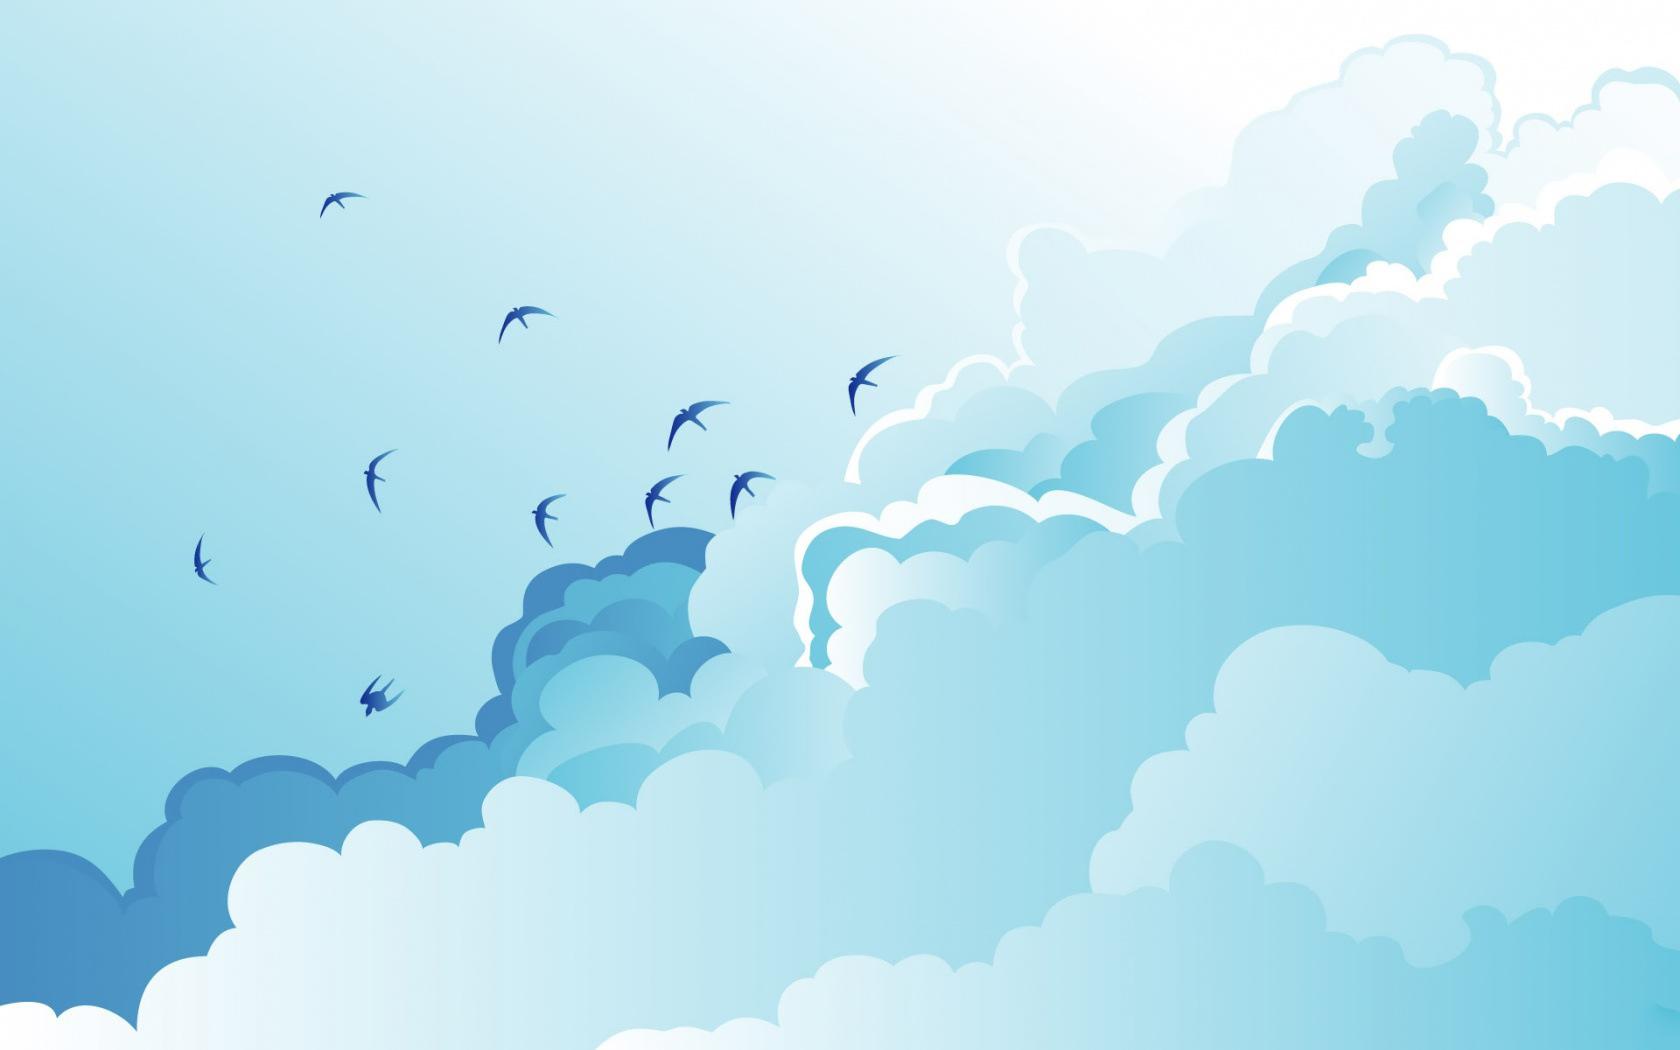 Hd blue sky clipart.